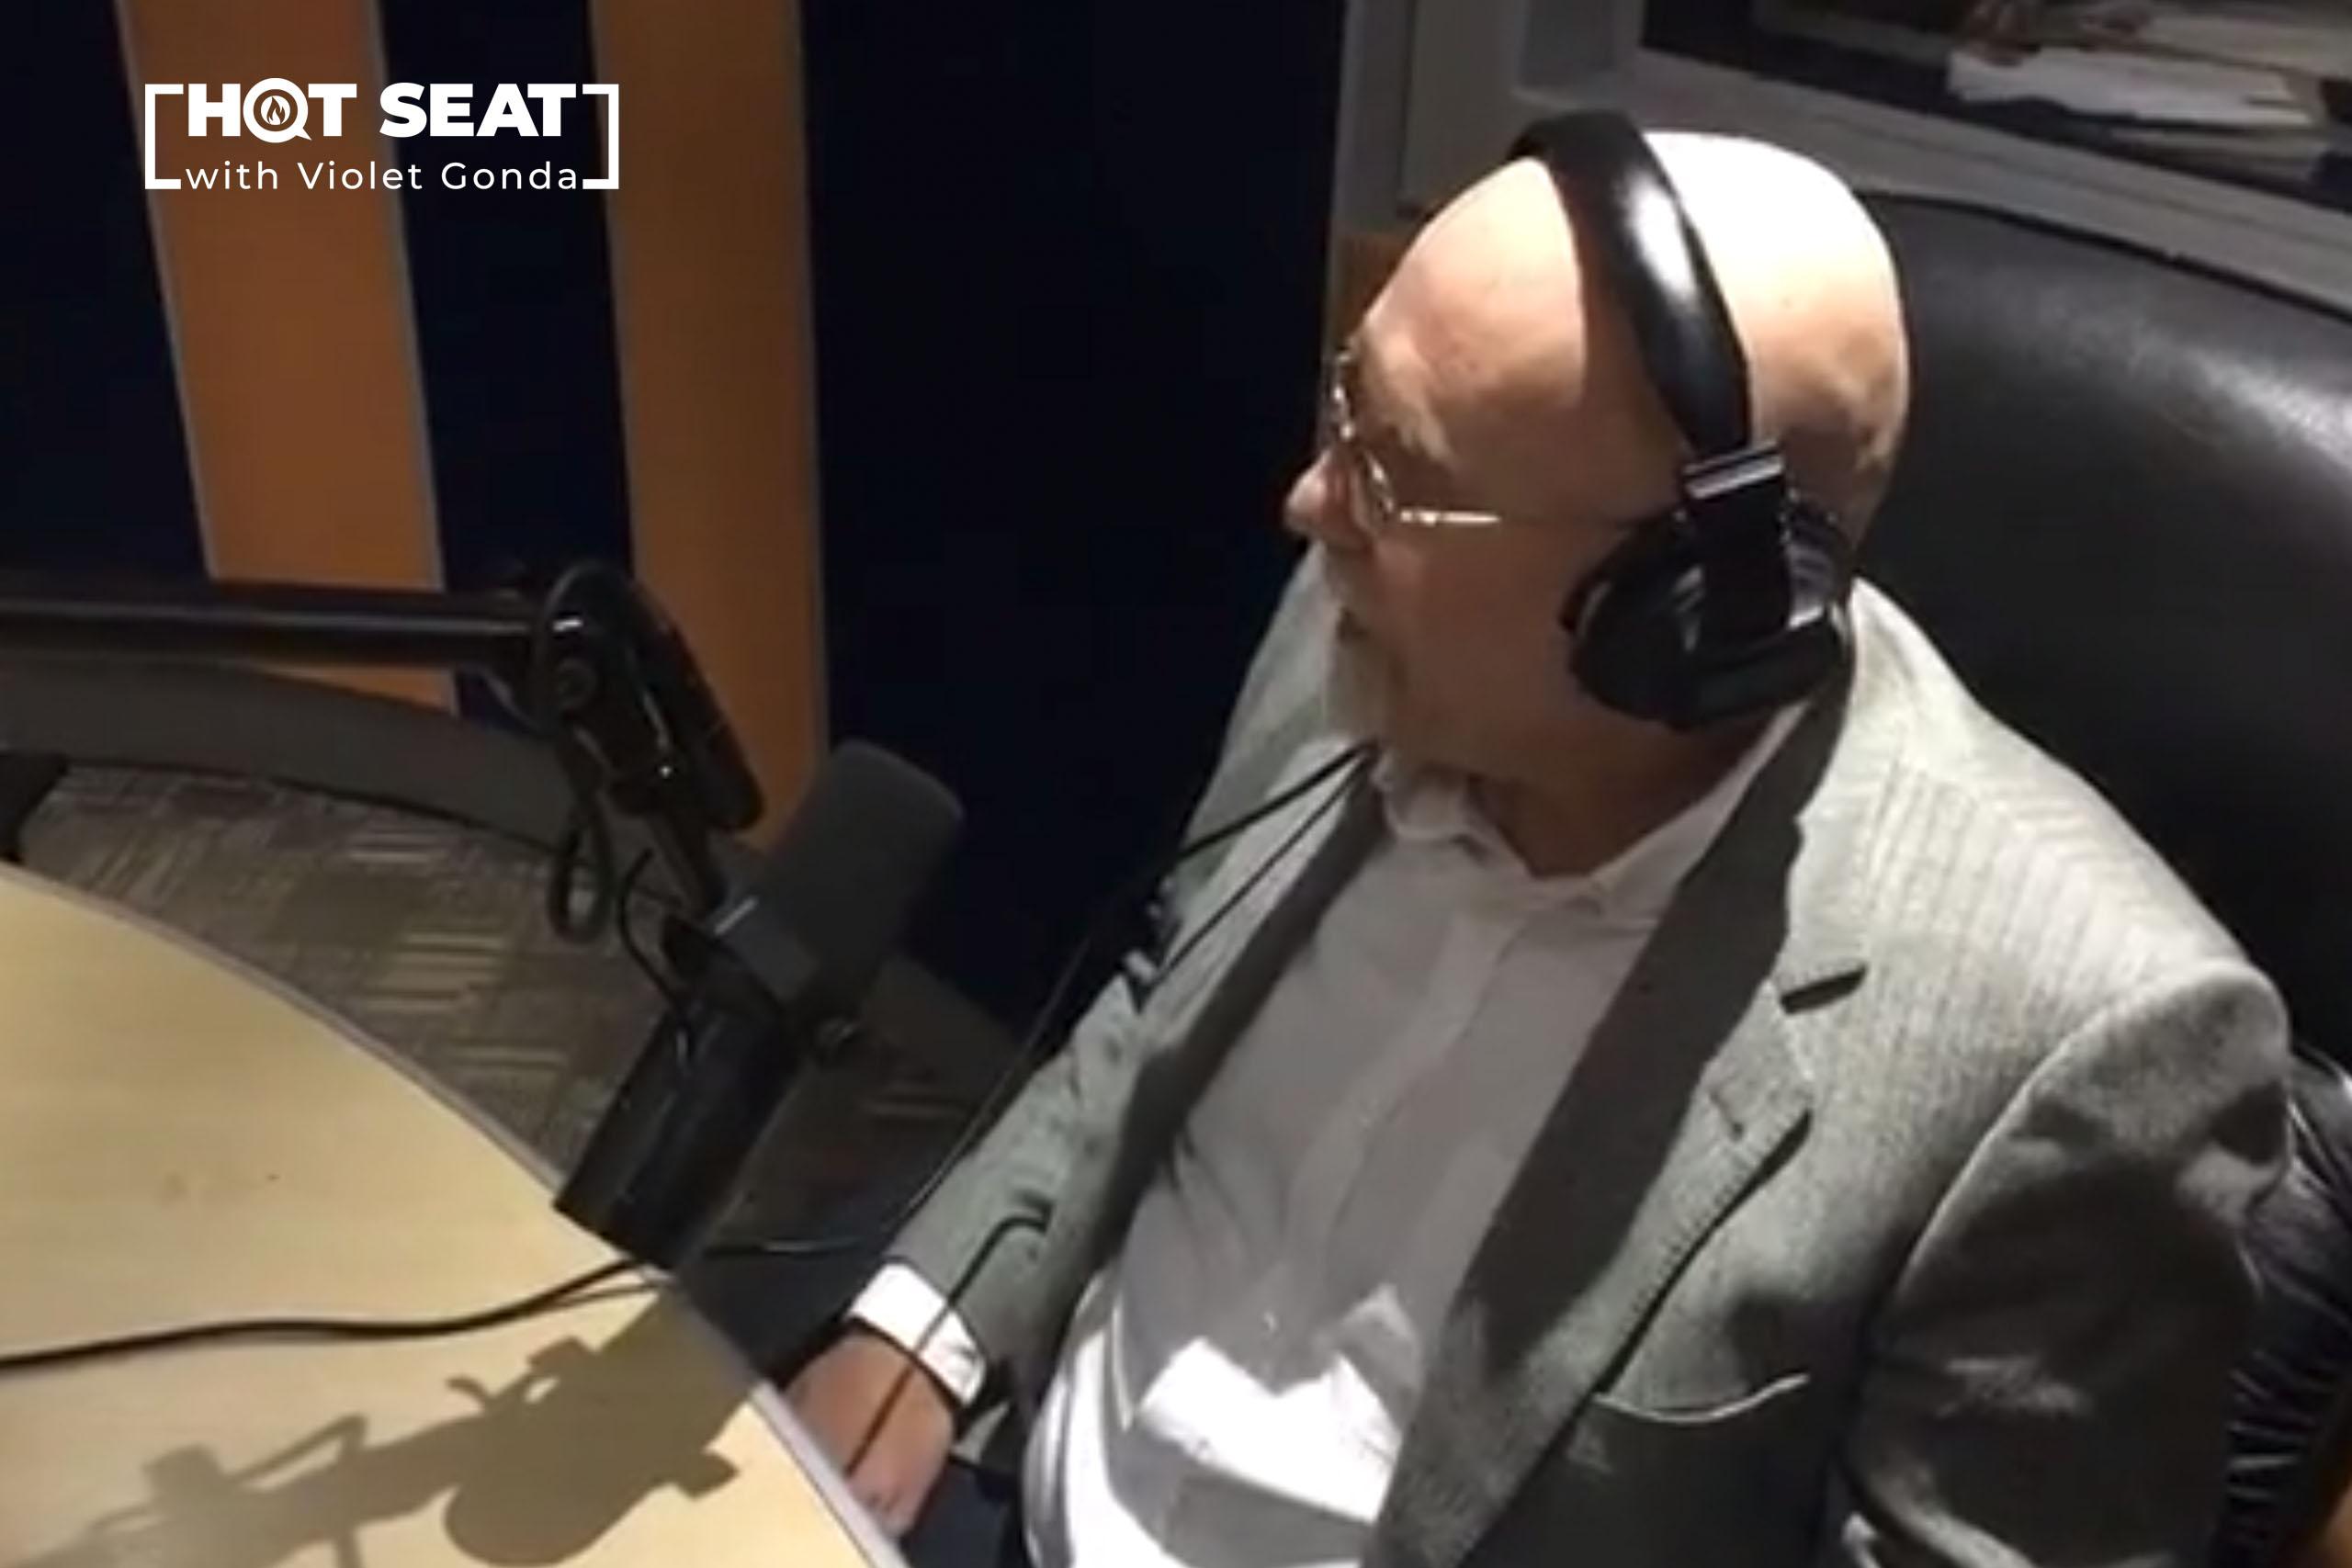 Hot Seat with Violet Gonda live radio debates in partnership with YETT broadcast on STARFM radio Episode 1: Voters Roll irregularities